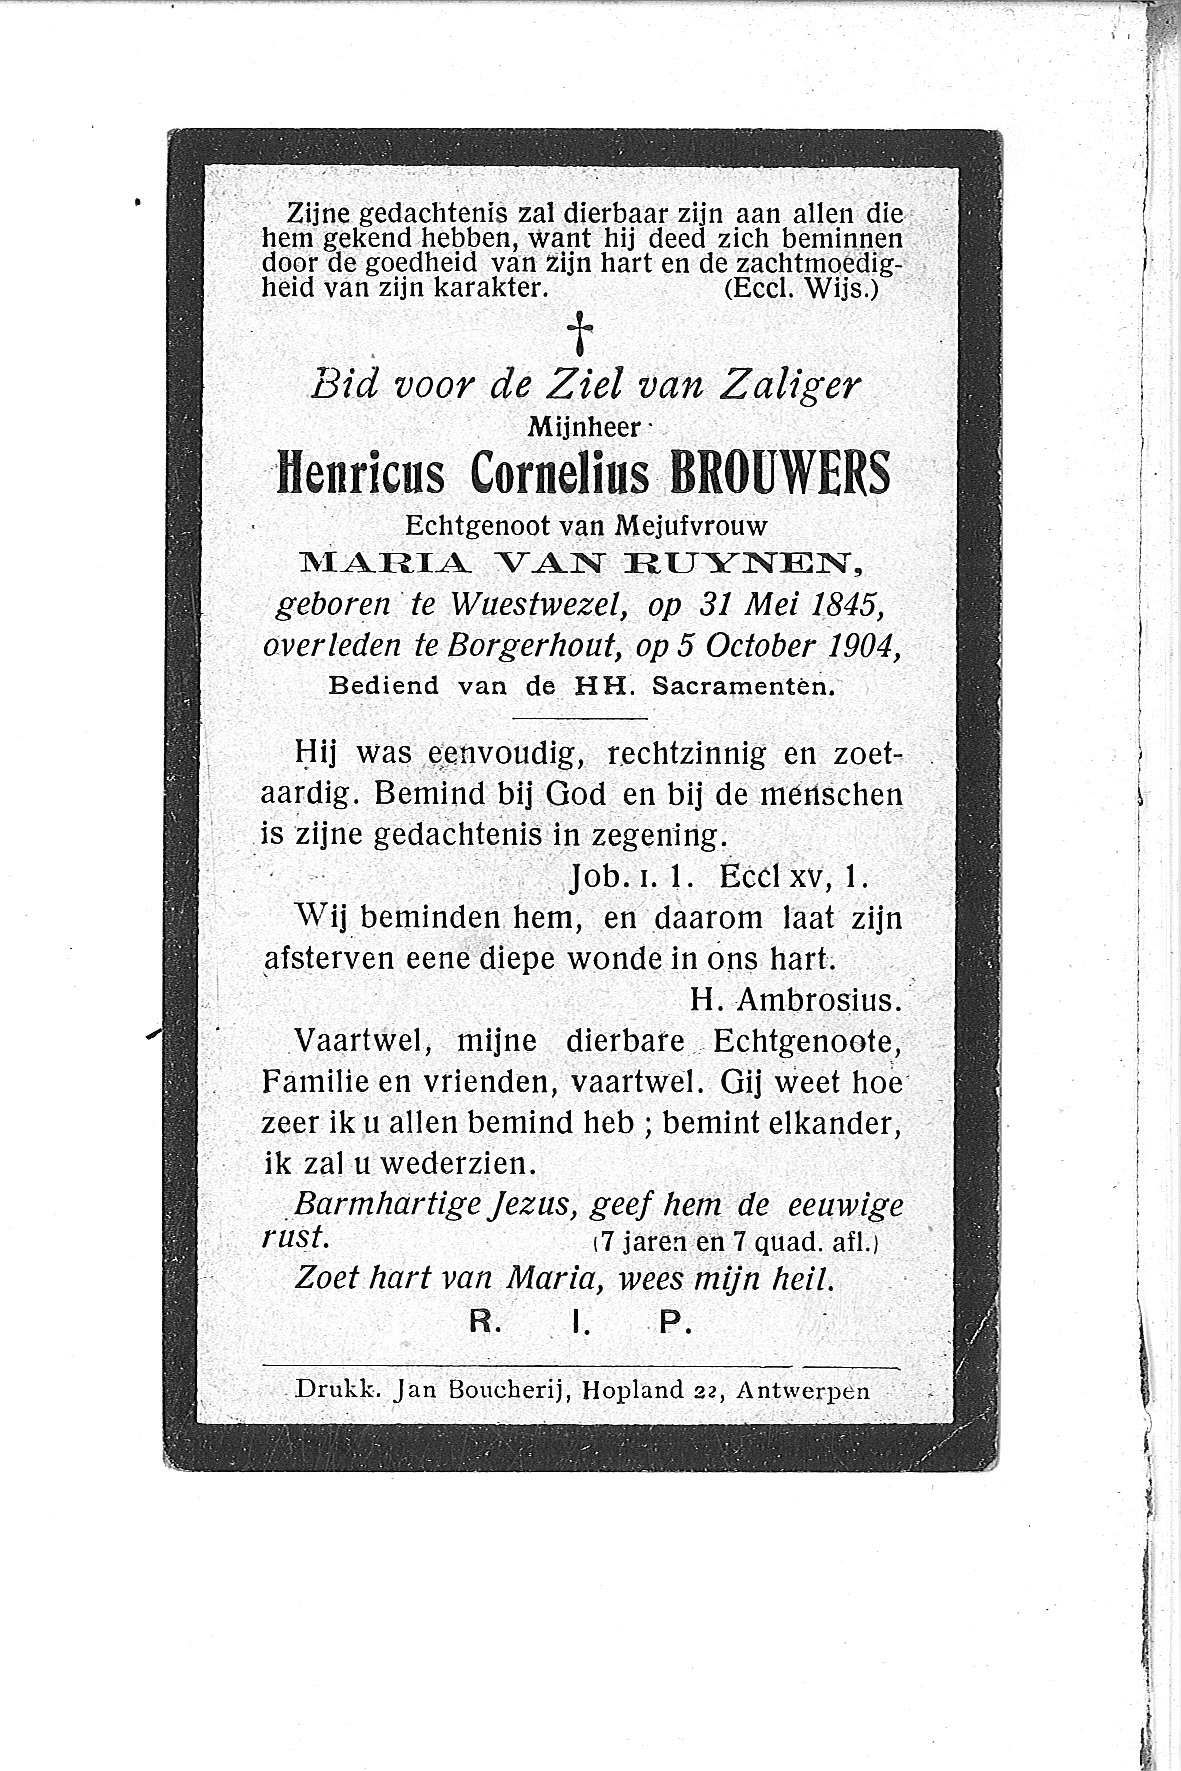 Henricus Cornelius (1904) 20110805165022_00058.jpg